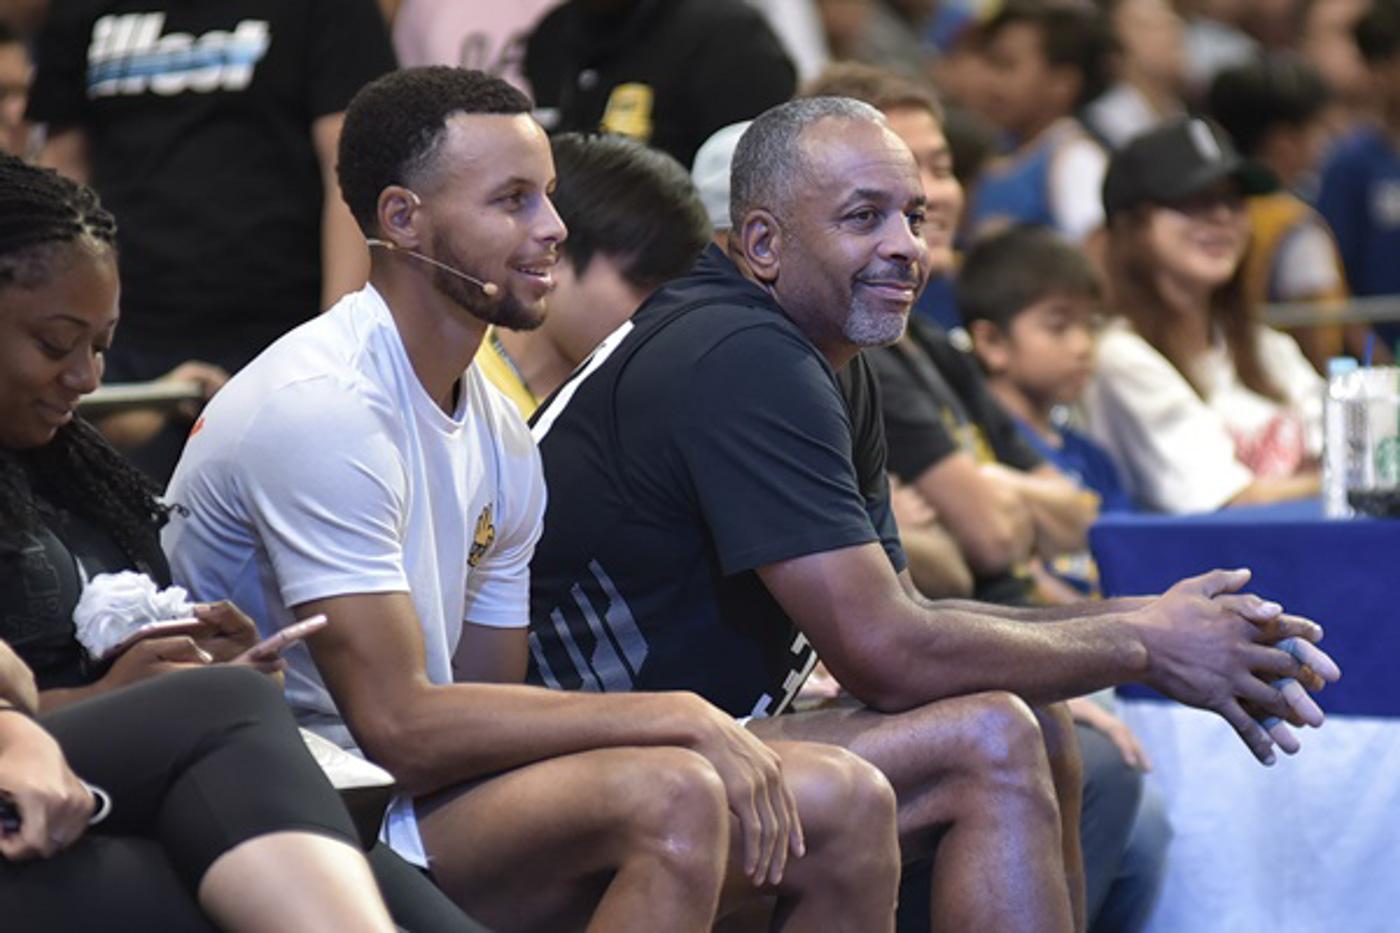 Curry父母起初不希望勇士選Curry:風格不合適,都不知道金州這個地方!-籃球圈